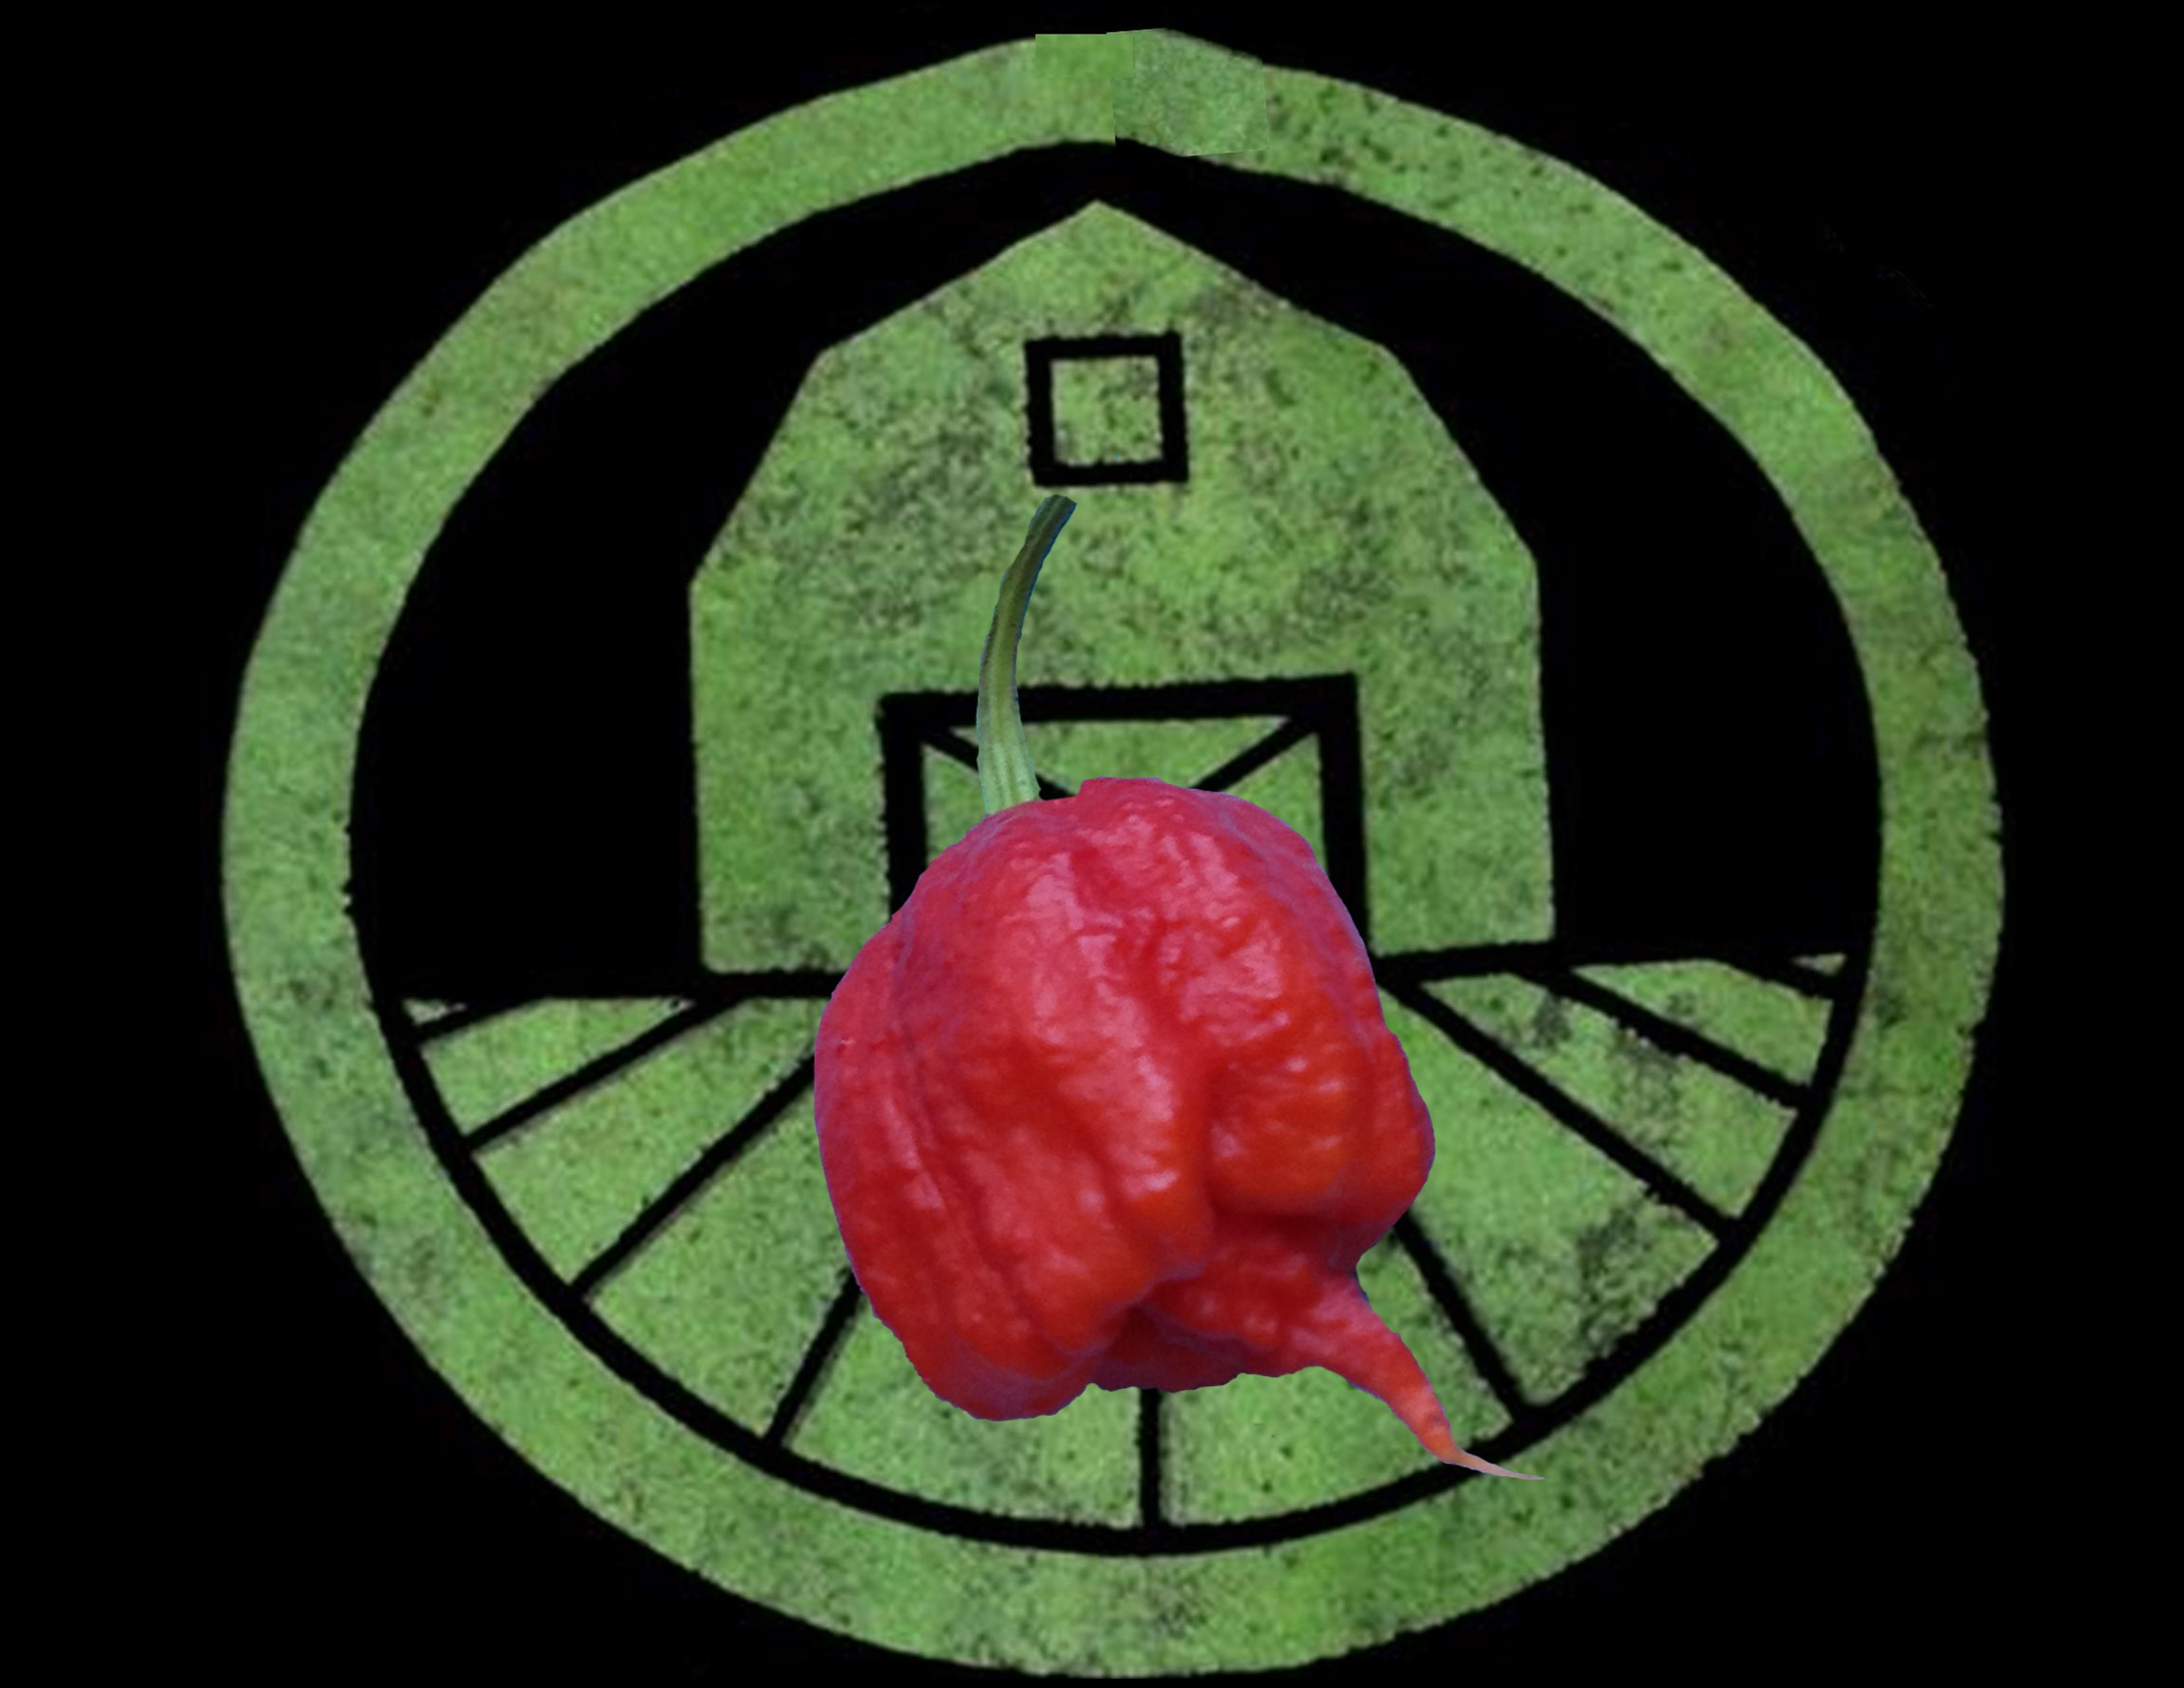 carolina-reaper-hottest-pepper-in-the-world-tyler-farms-organic-seed-company-1-.jpg